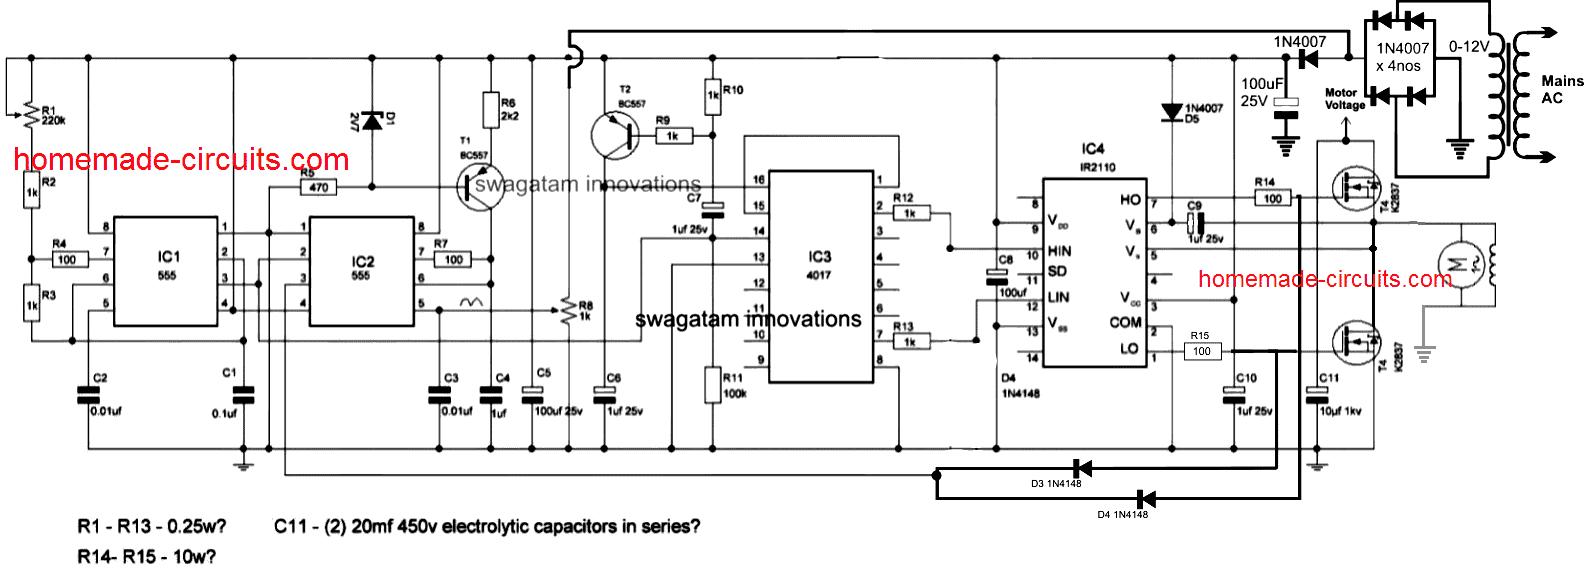 Cadillac Cruise Control Circuit 555circuit Circuit Diagram